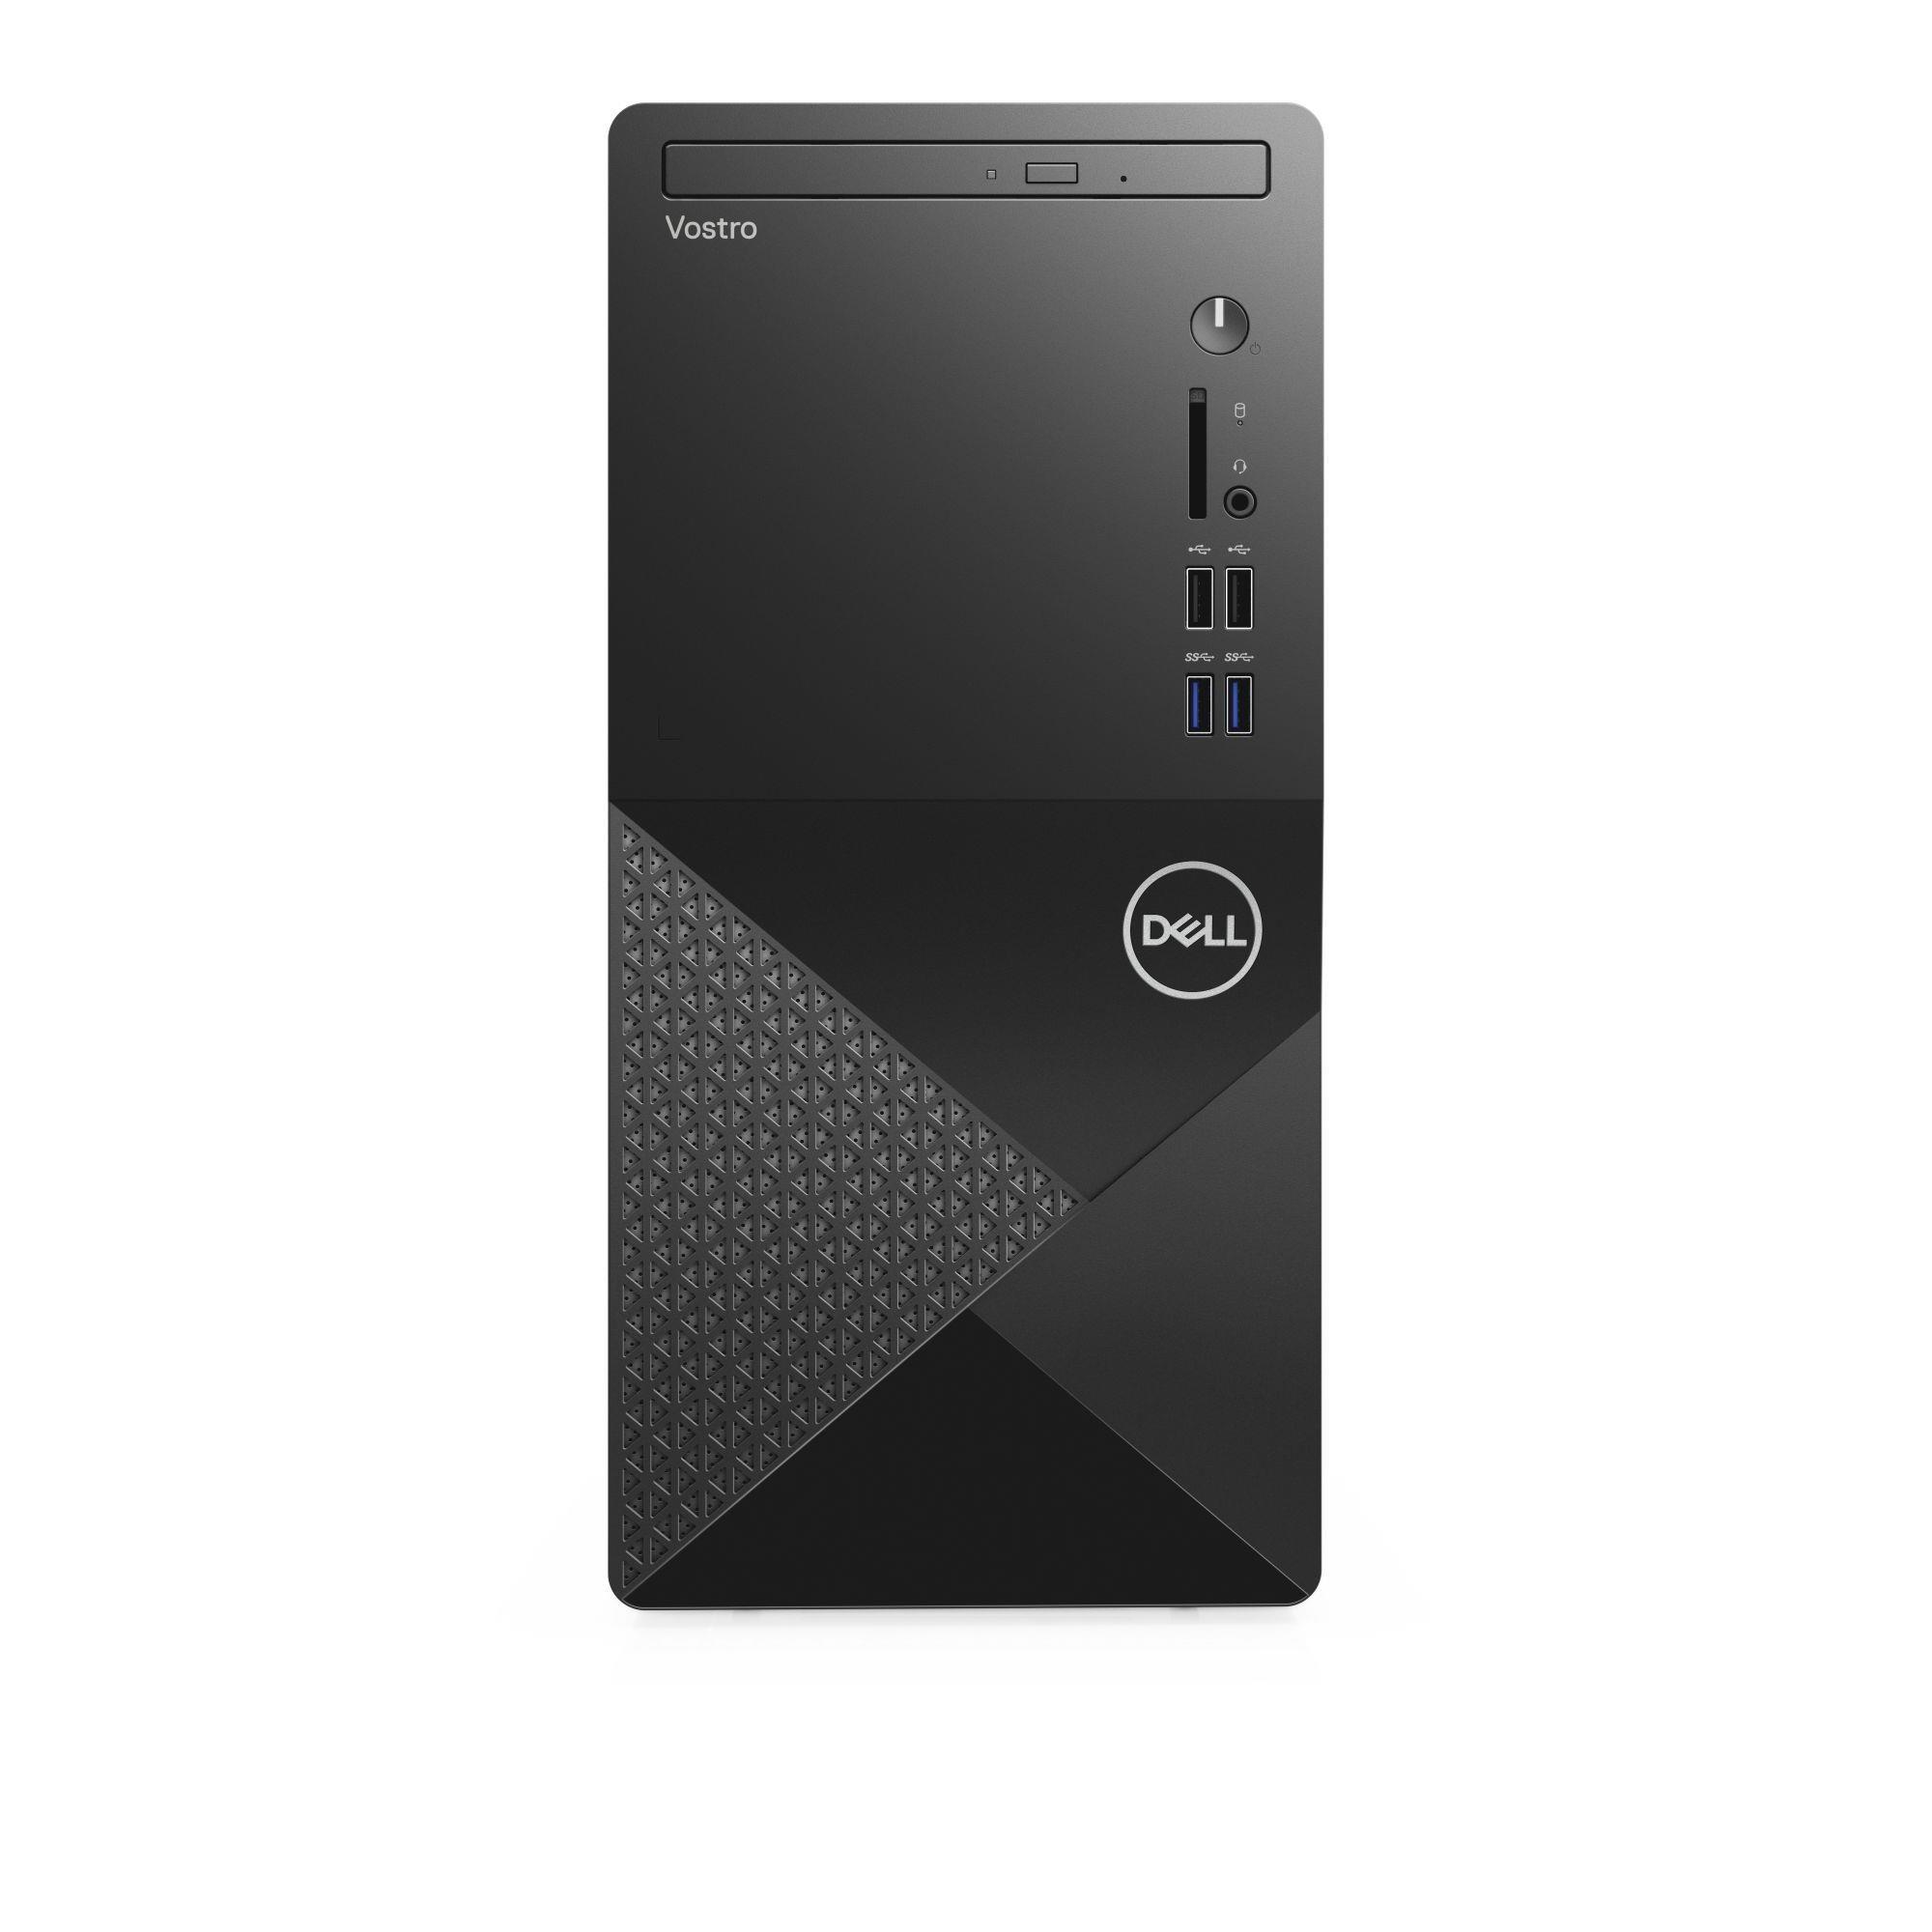 Komputer Dell Vostro 3888 MT i3-10100 8GB SSD256GB UHD630 DVD-RW 10PR 3Y